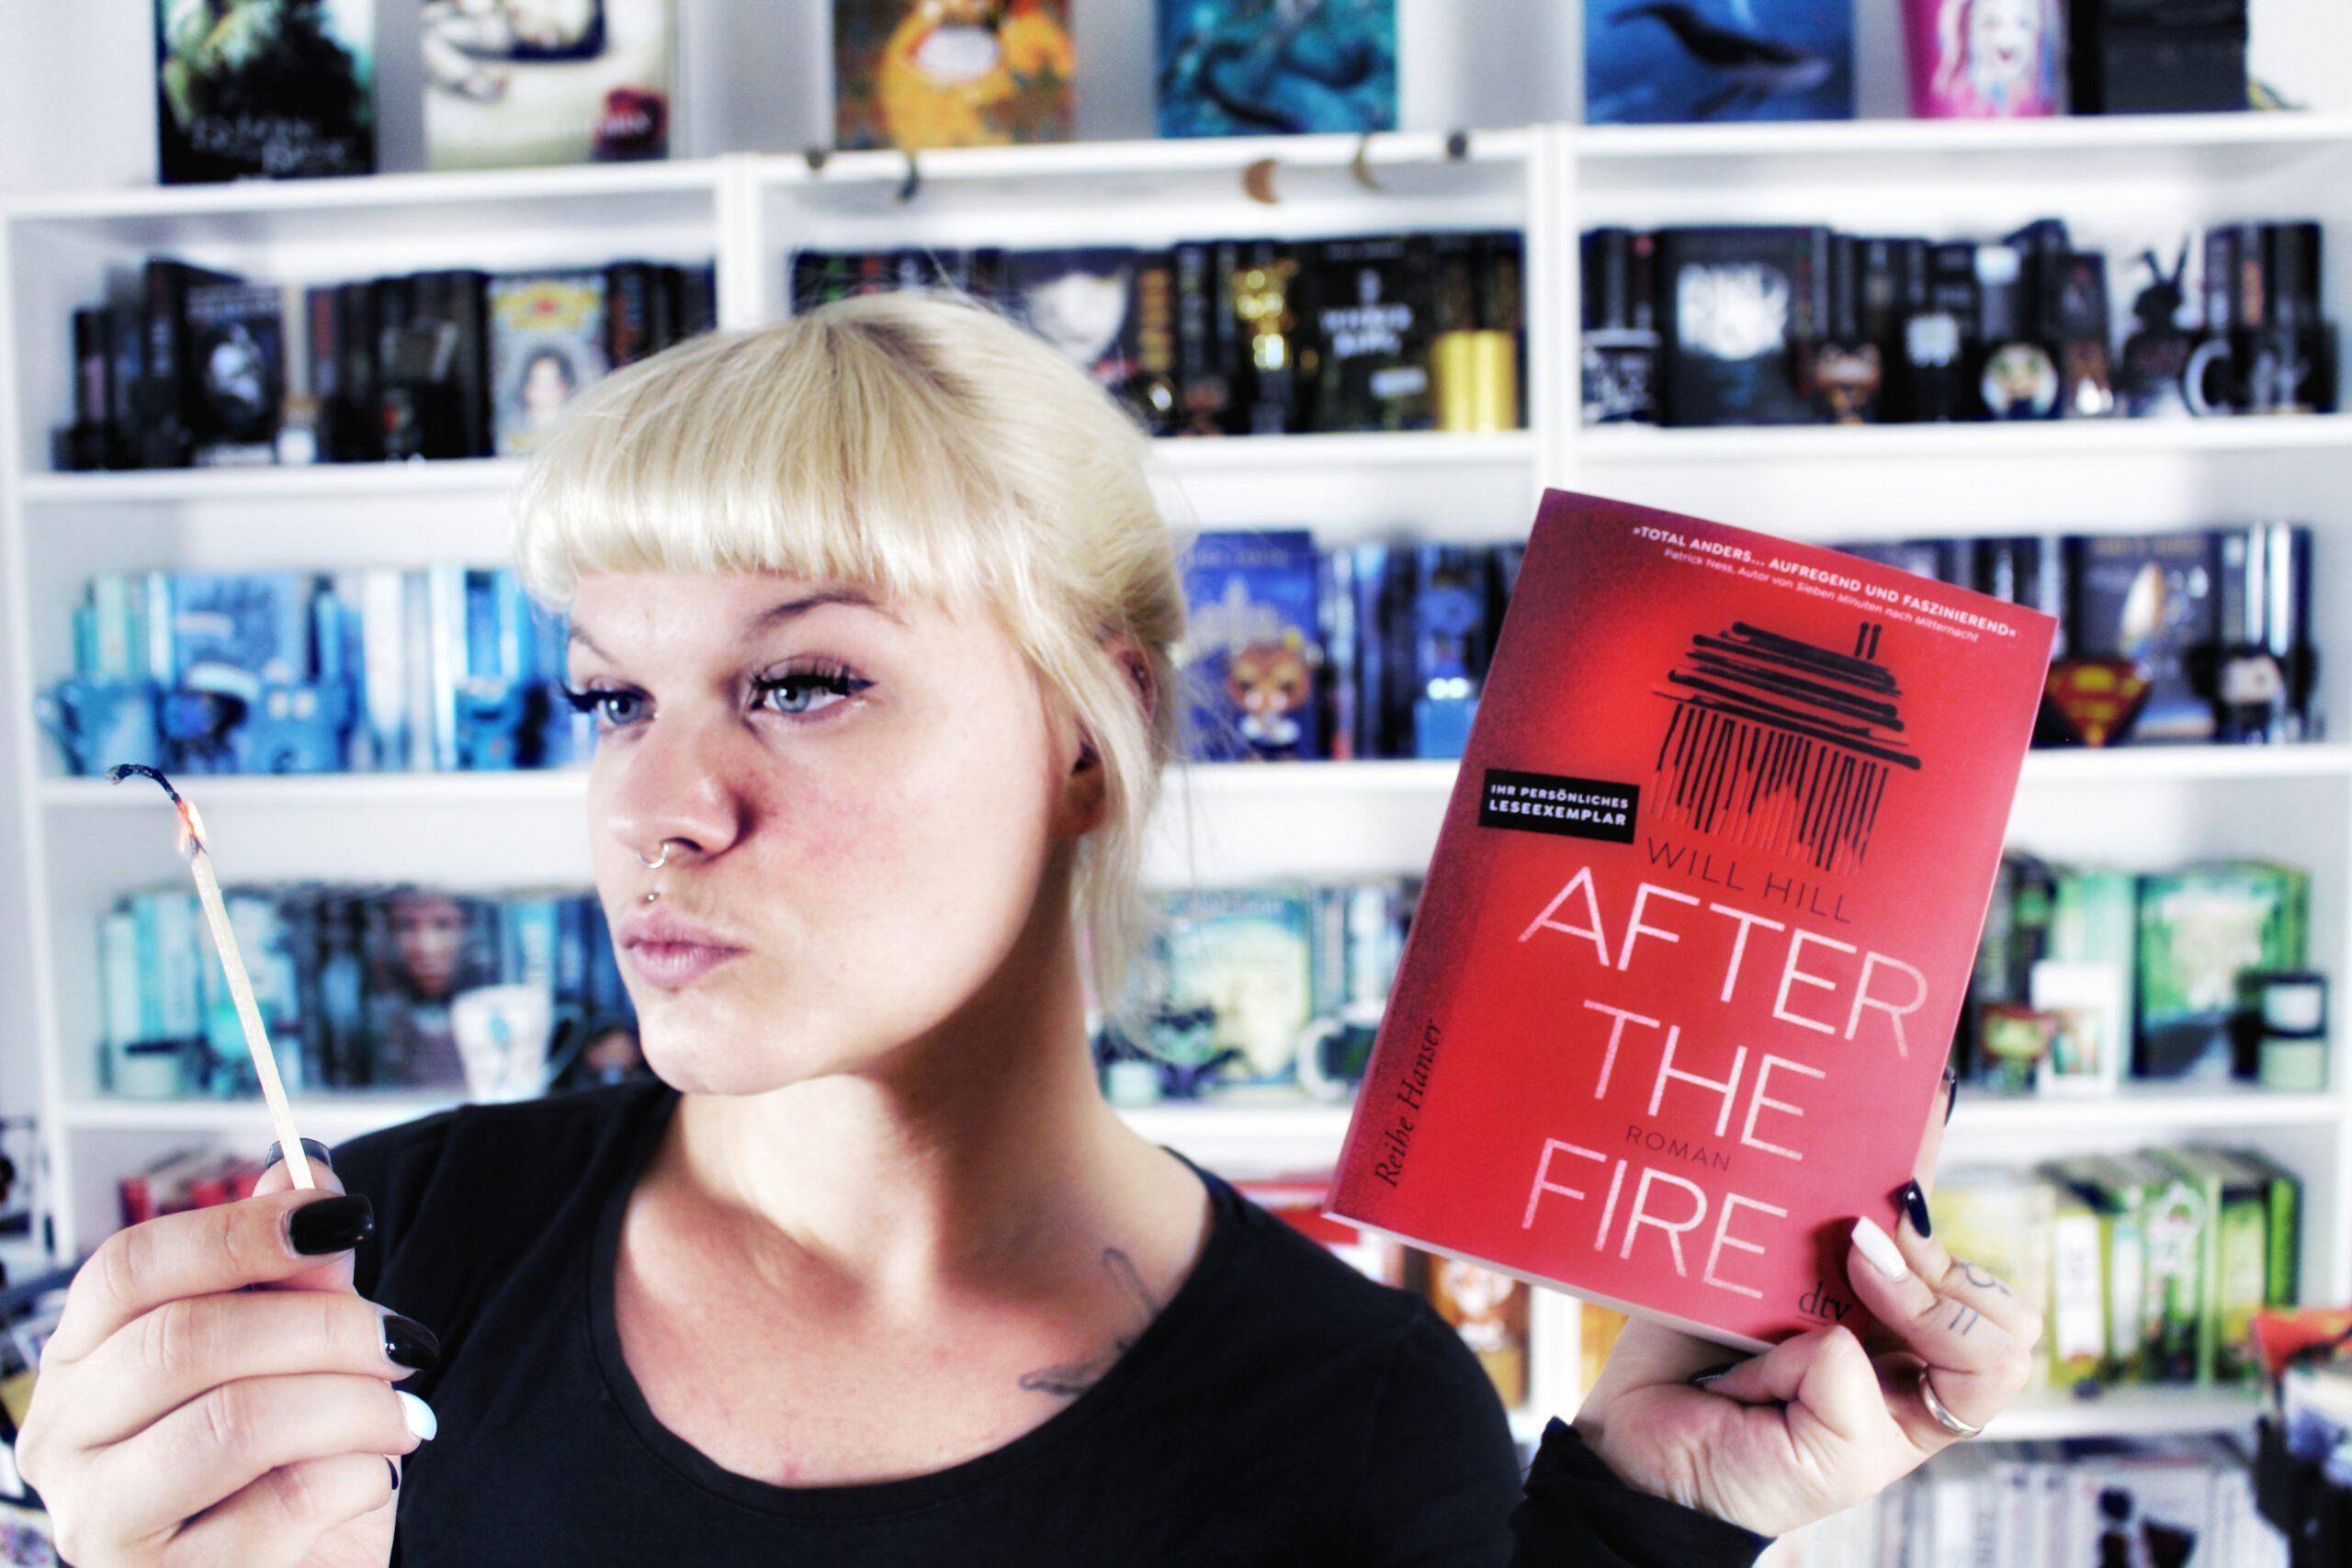 Rezension | After the Fire von Will Hill